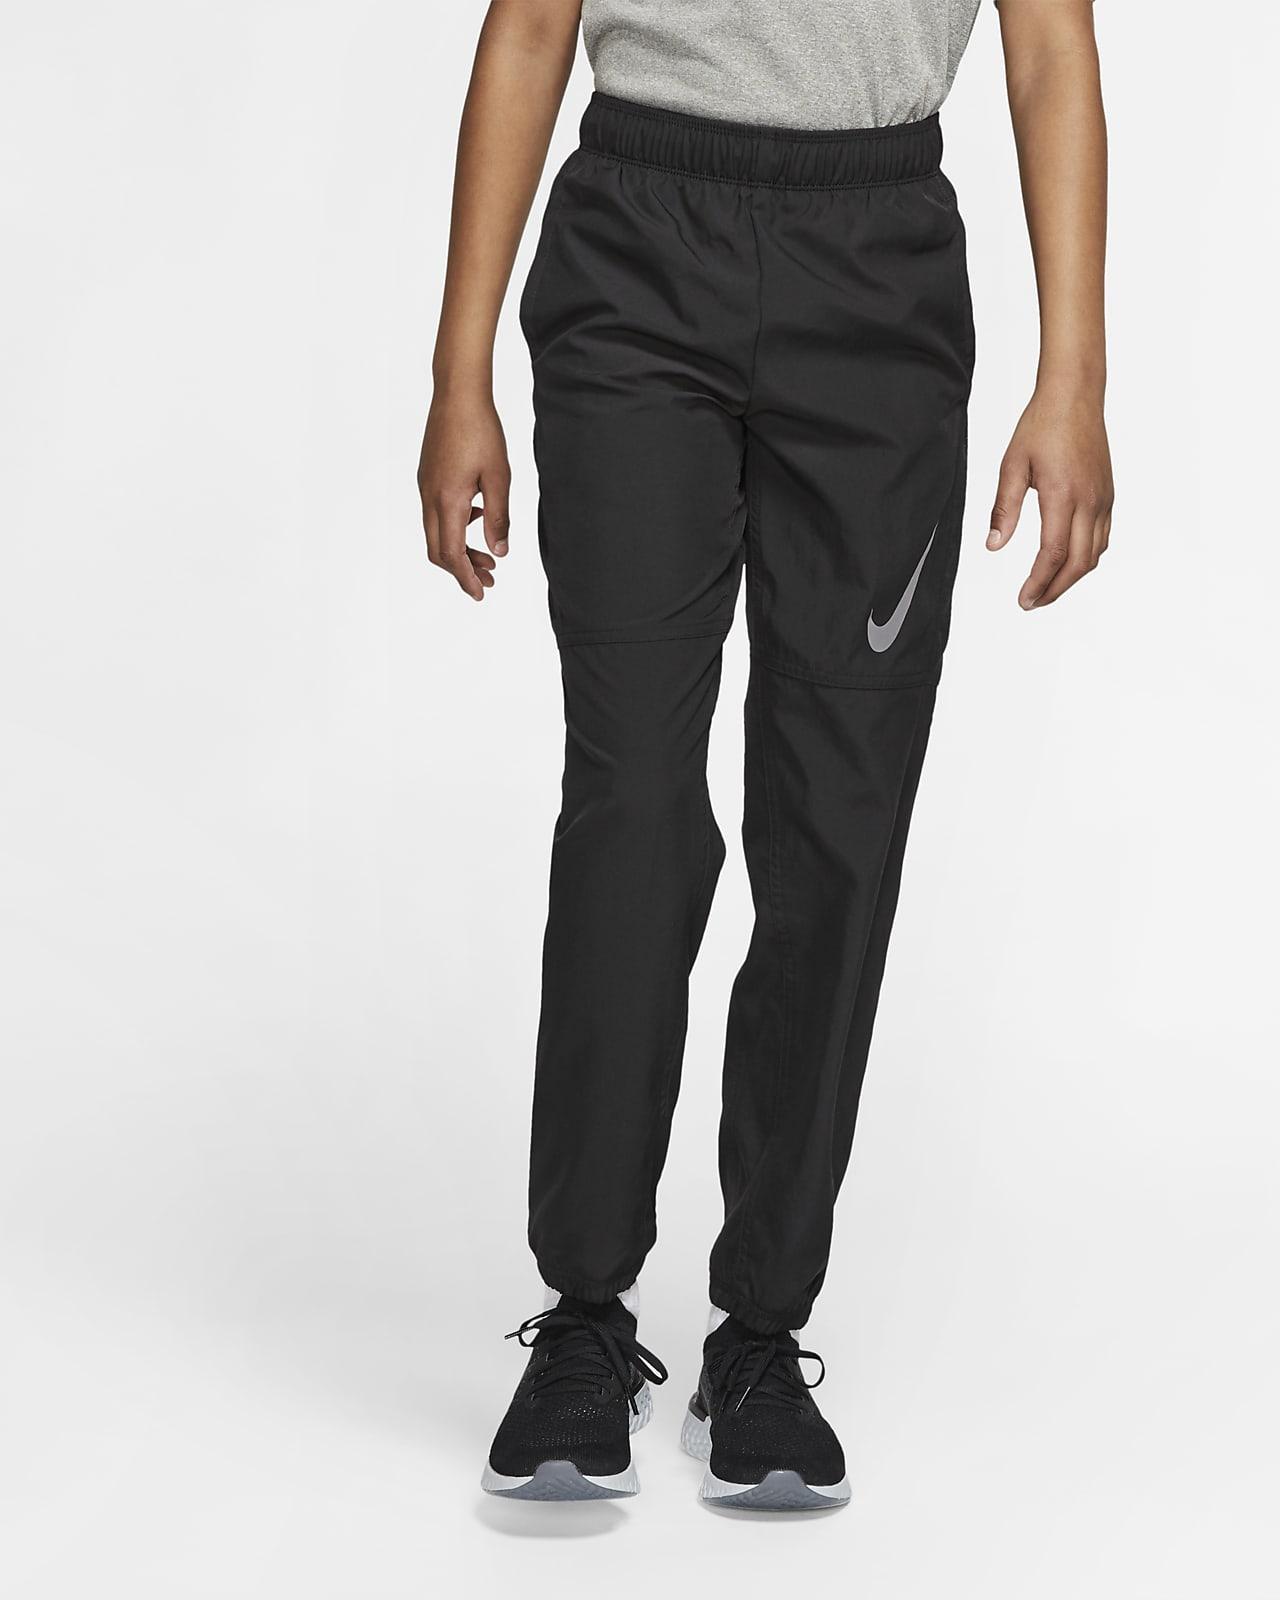 Nike Big Kids' (Boys') Training Pants